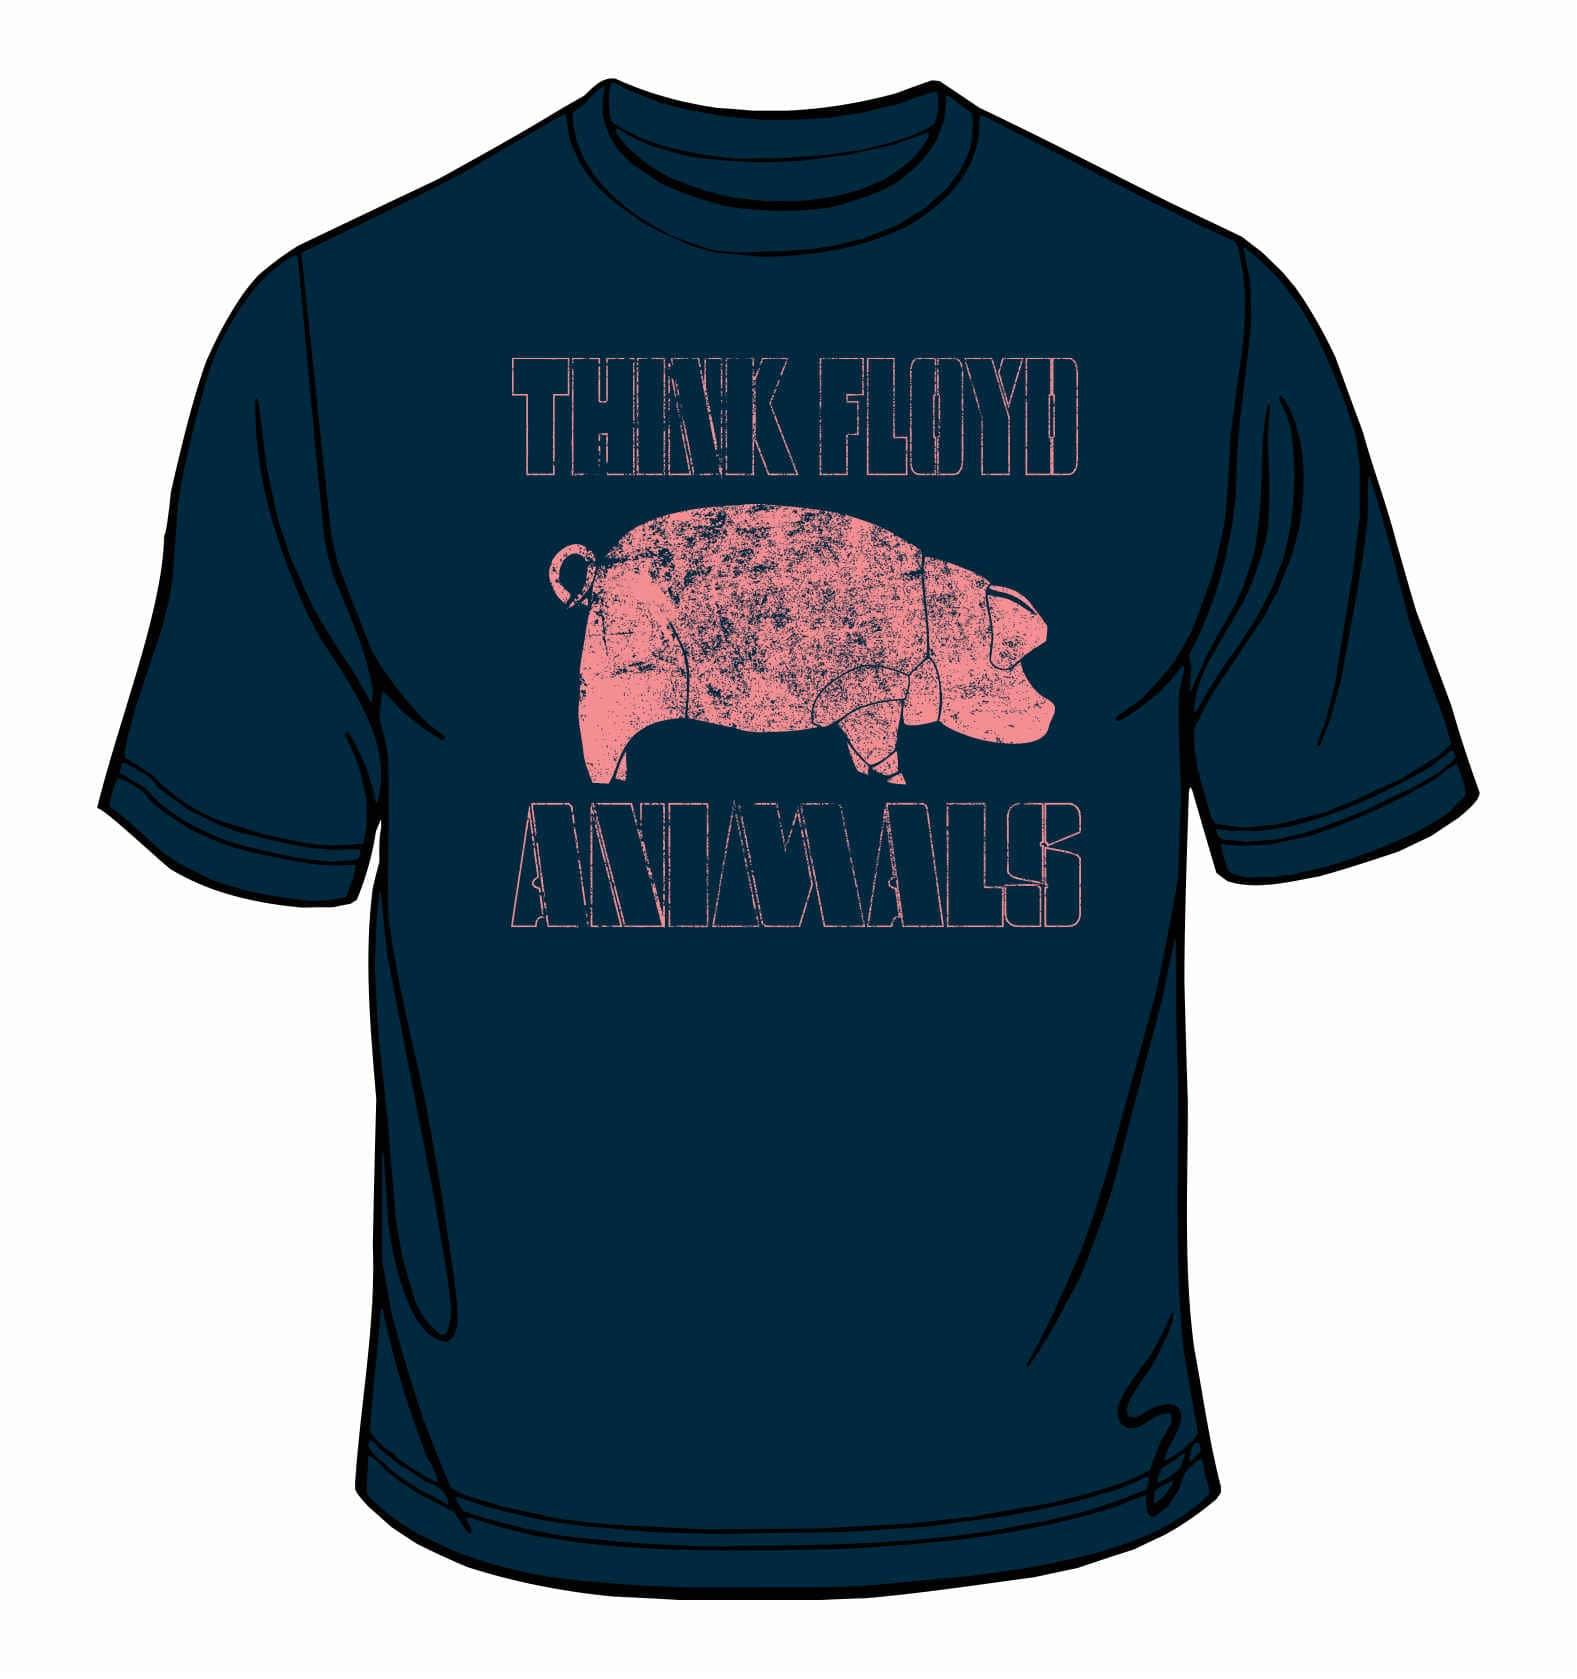 ANIMALS T-Shirt Navy Blue